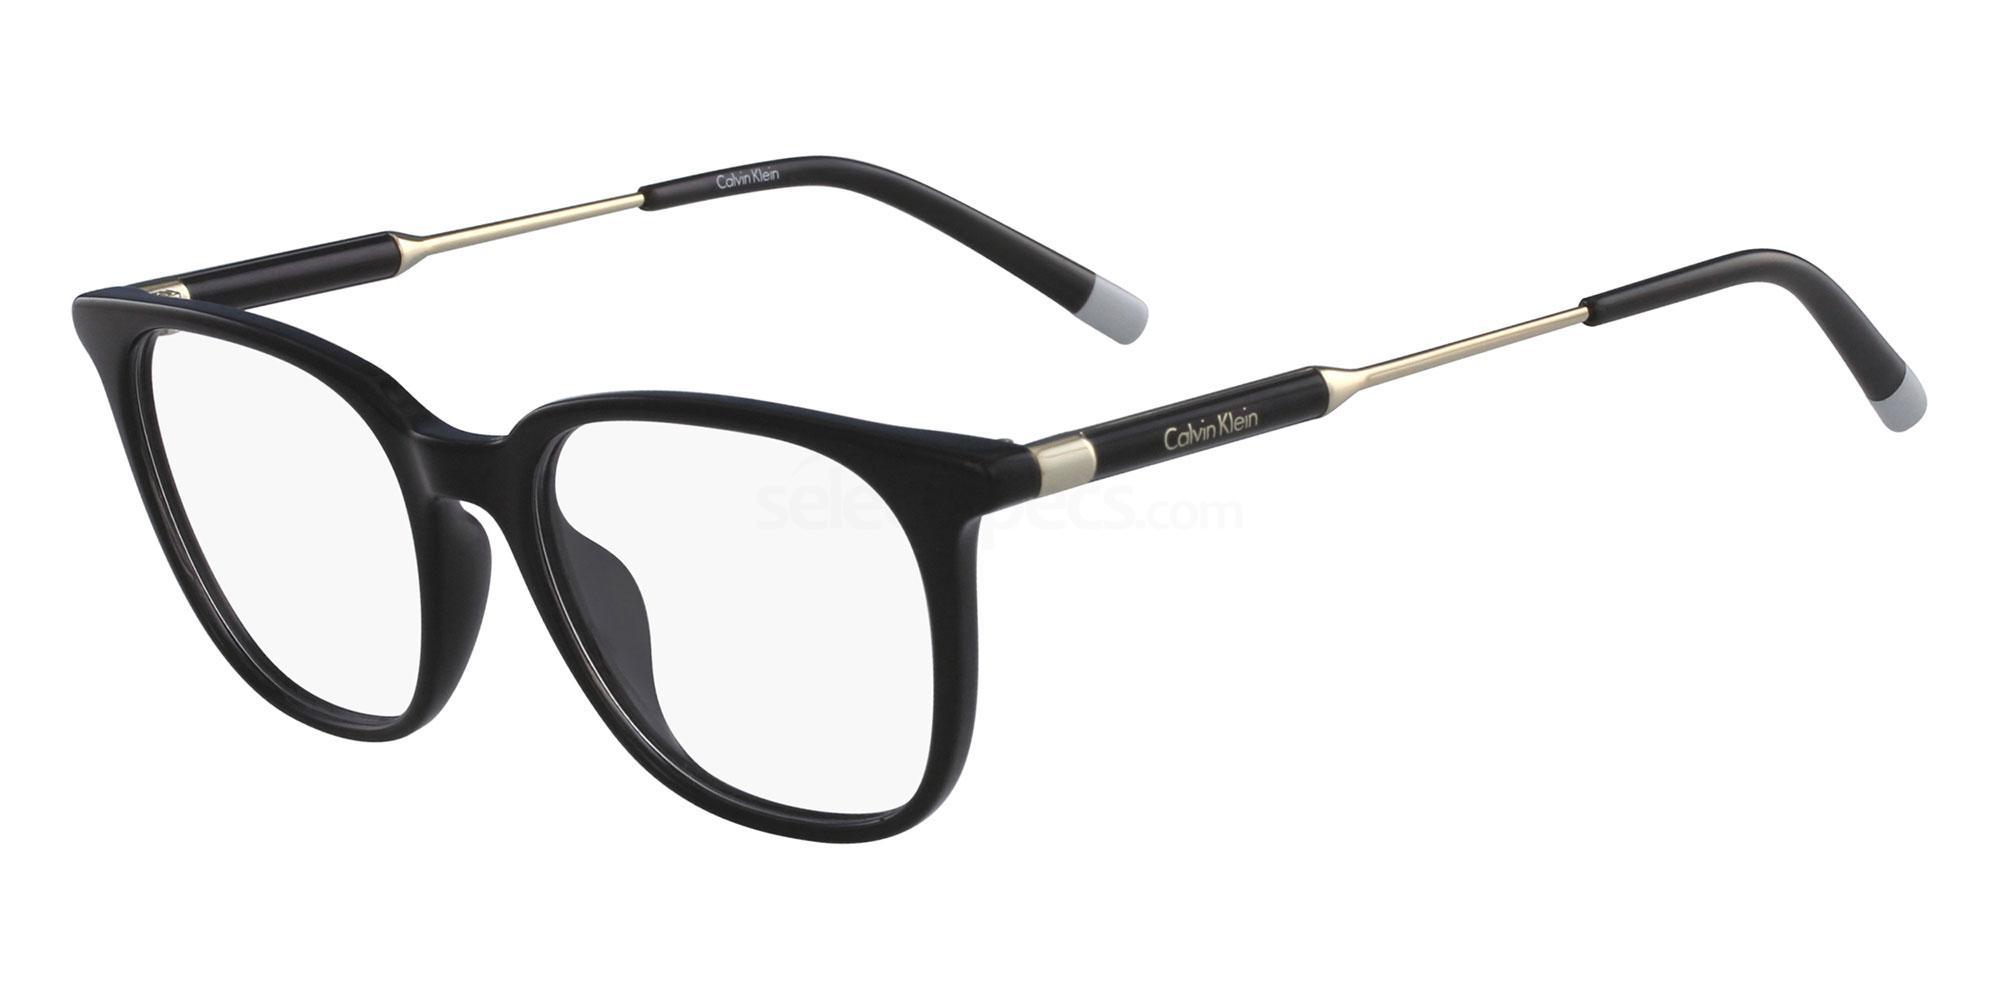 001 CK6008 Glasses, Calvin Klein